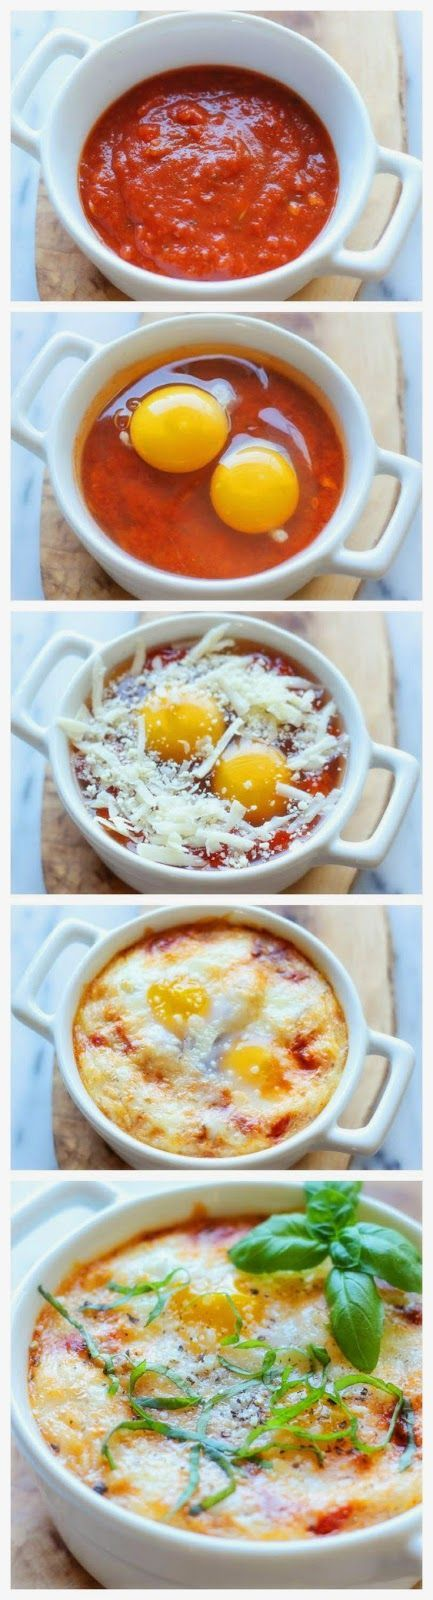 Italienische gebackene Eier